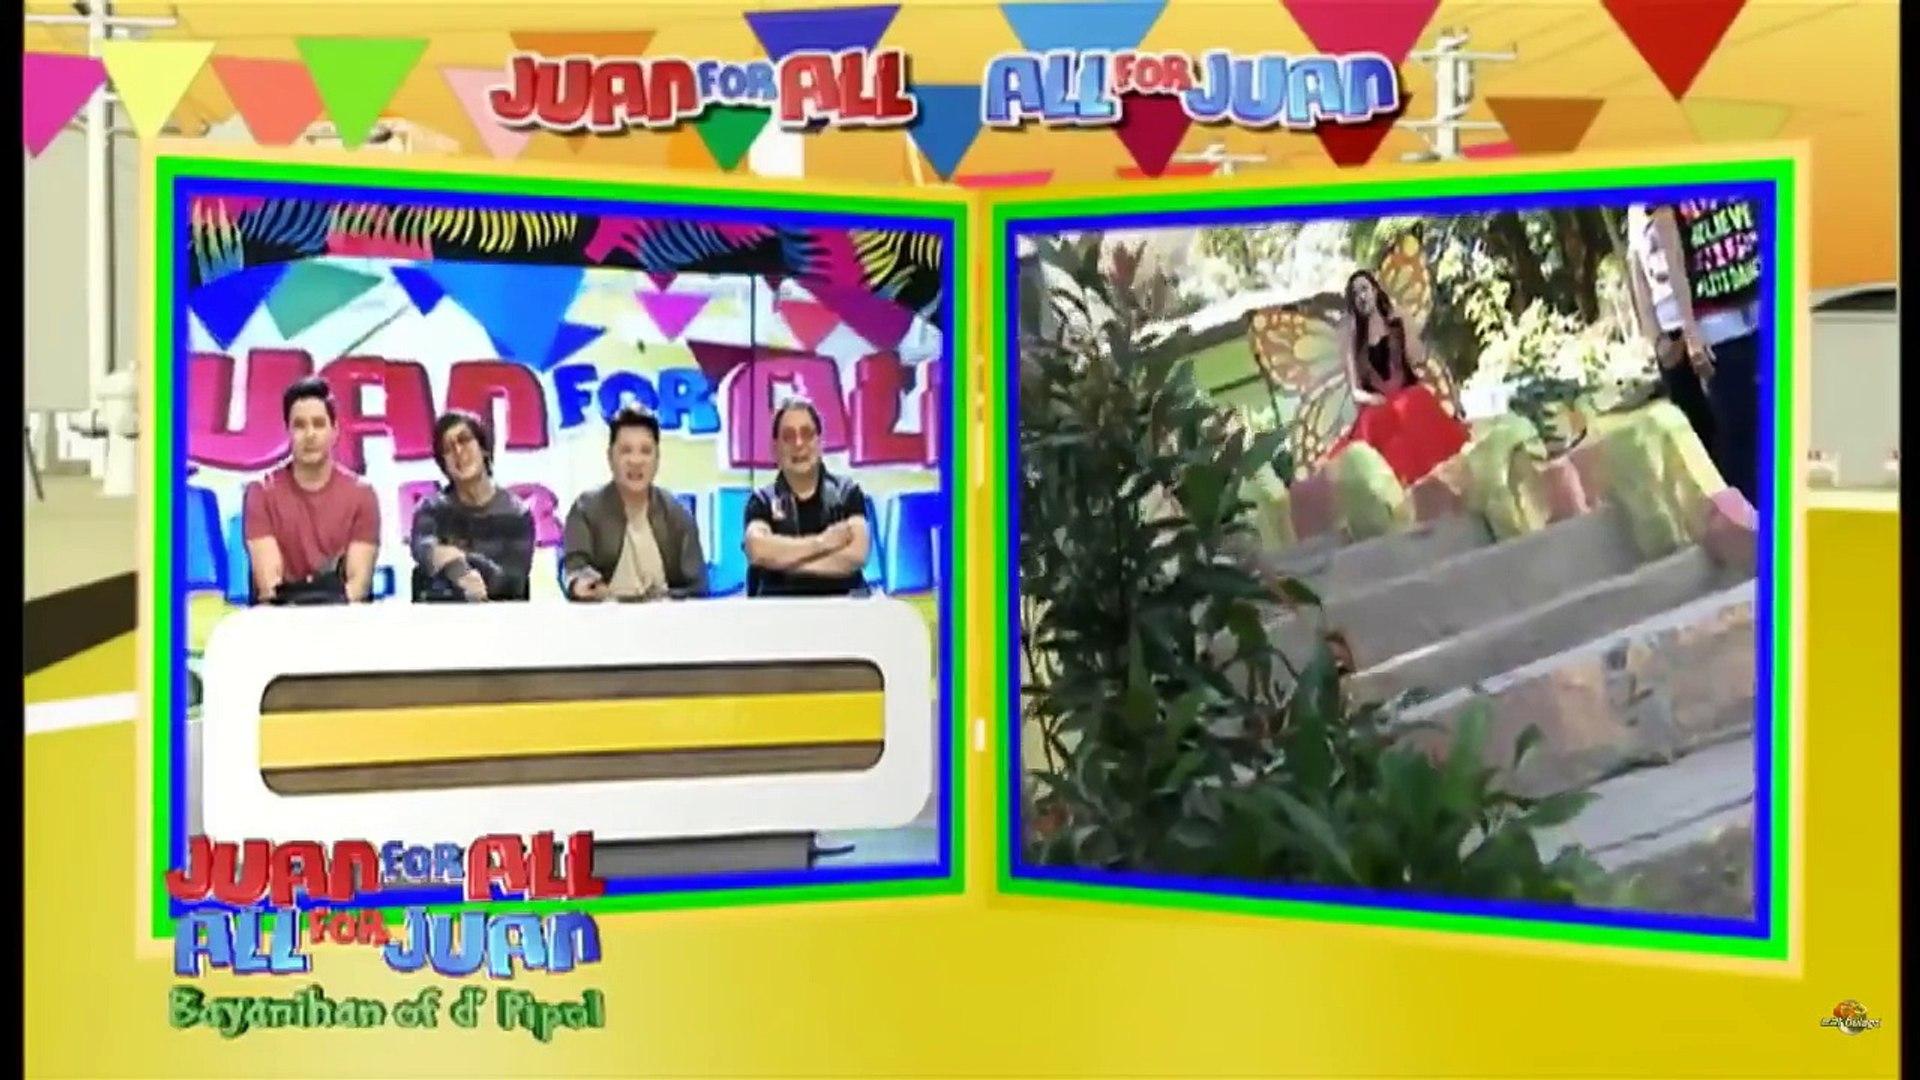 Eat Bulaga February 23, 2018 (FULL) Juan for All - All for Juan Sugod Bahay HD